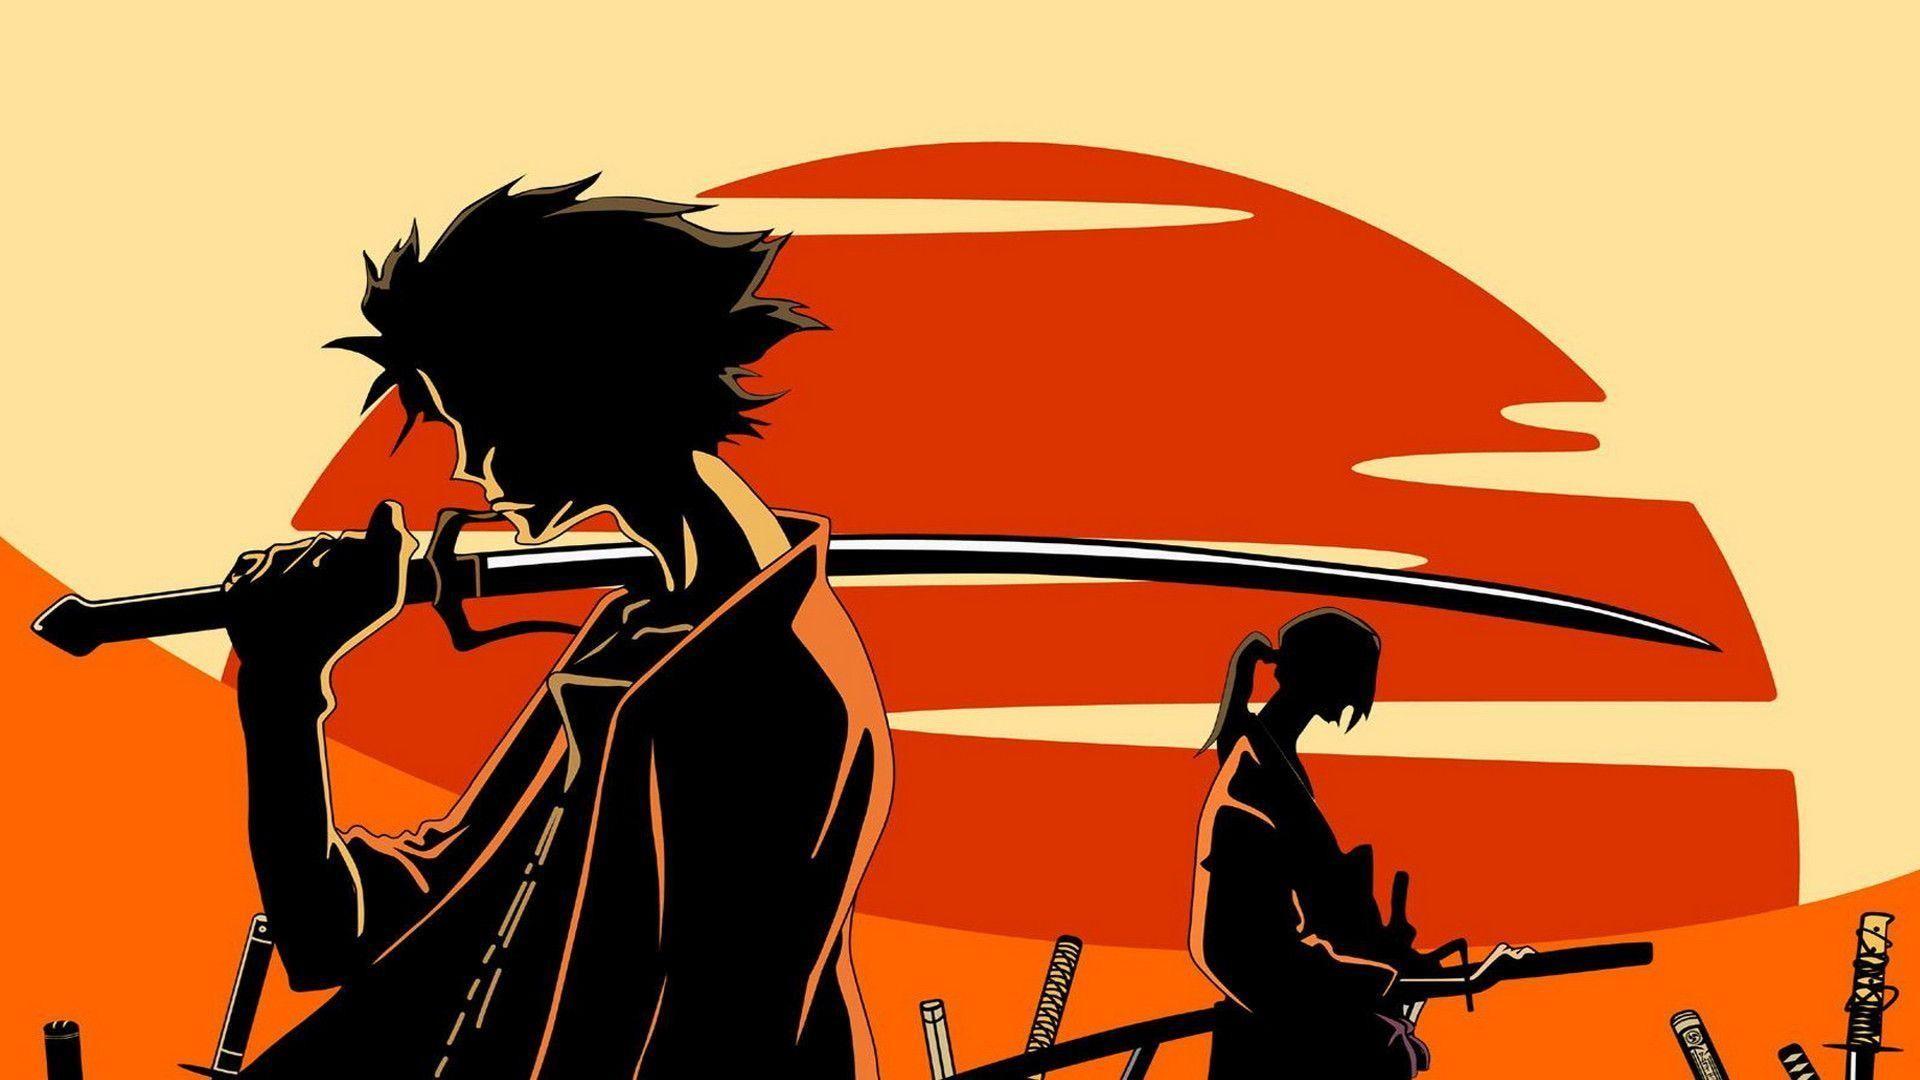 Res: 1920x1080, 66 Samurai Champloo Wallpapers | Samurai Champloo Backgrounds